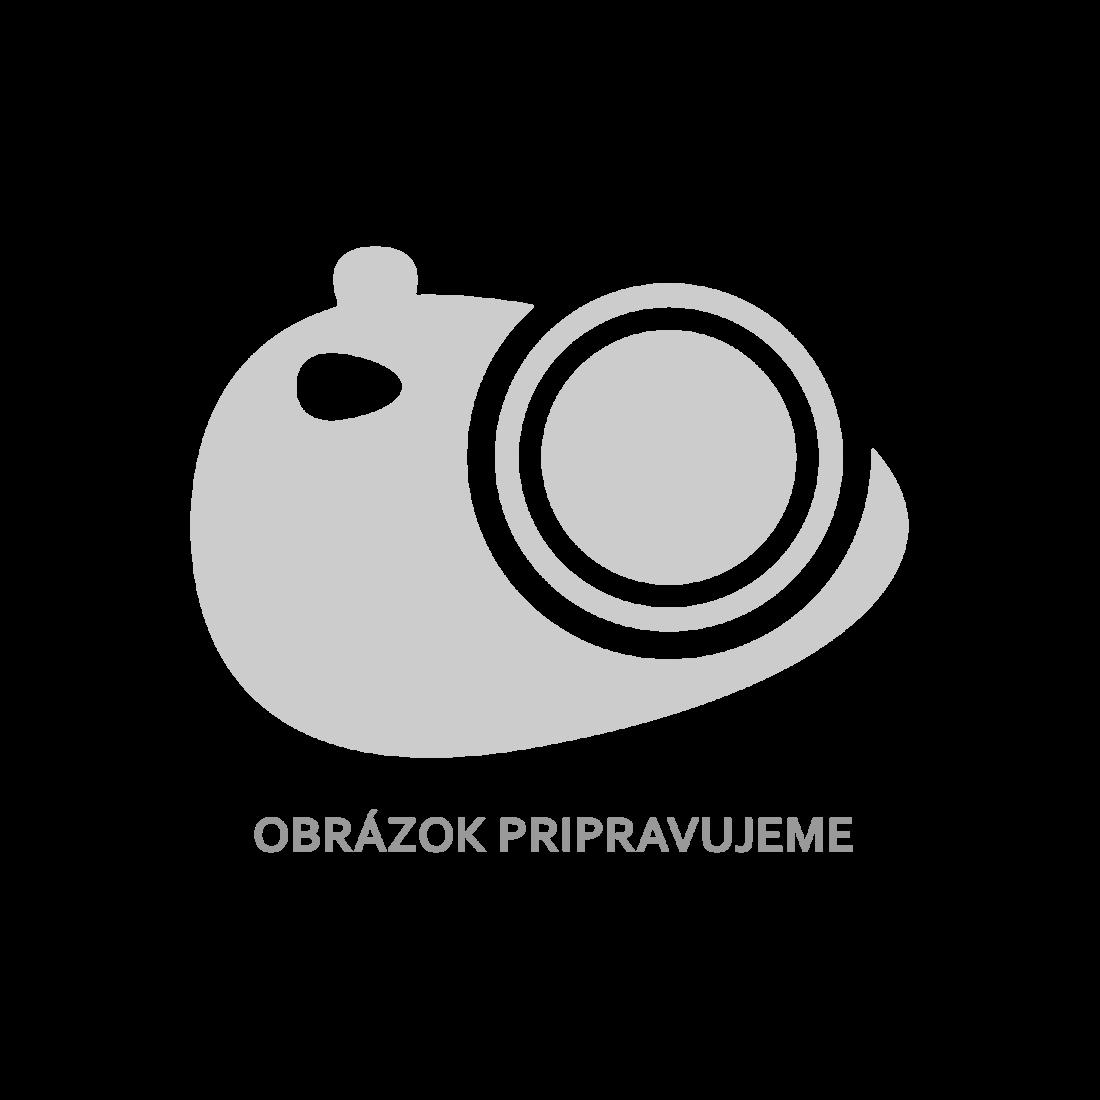 vidaXL Úložný box na LP desky bílý 71 x 34 x 36 cm dřevotříska [800117]